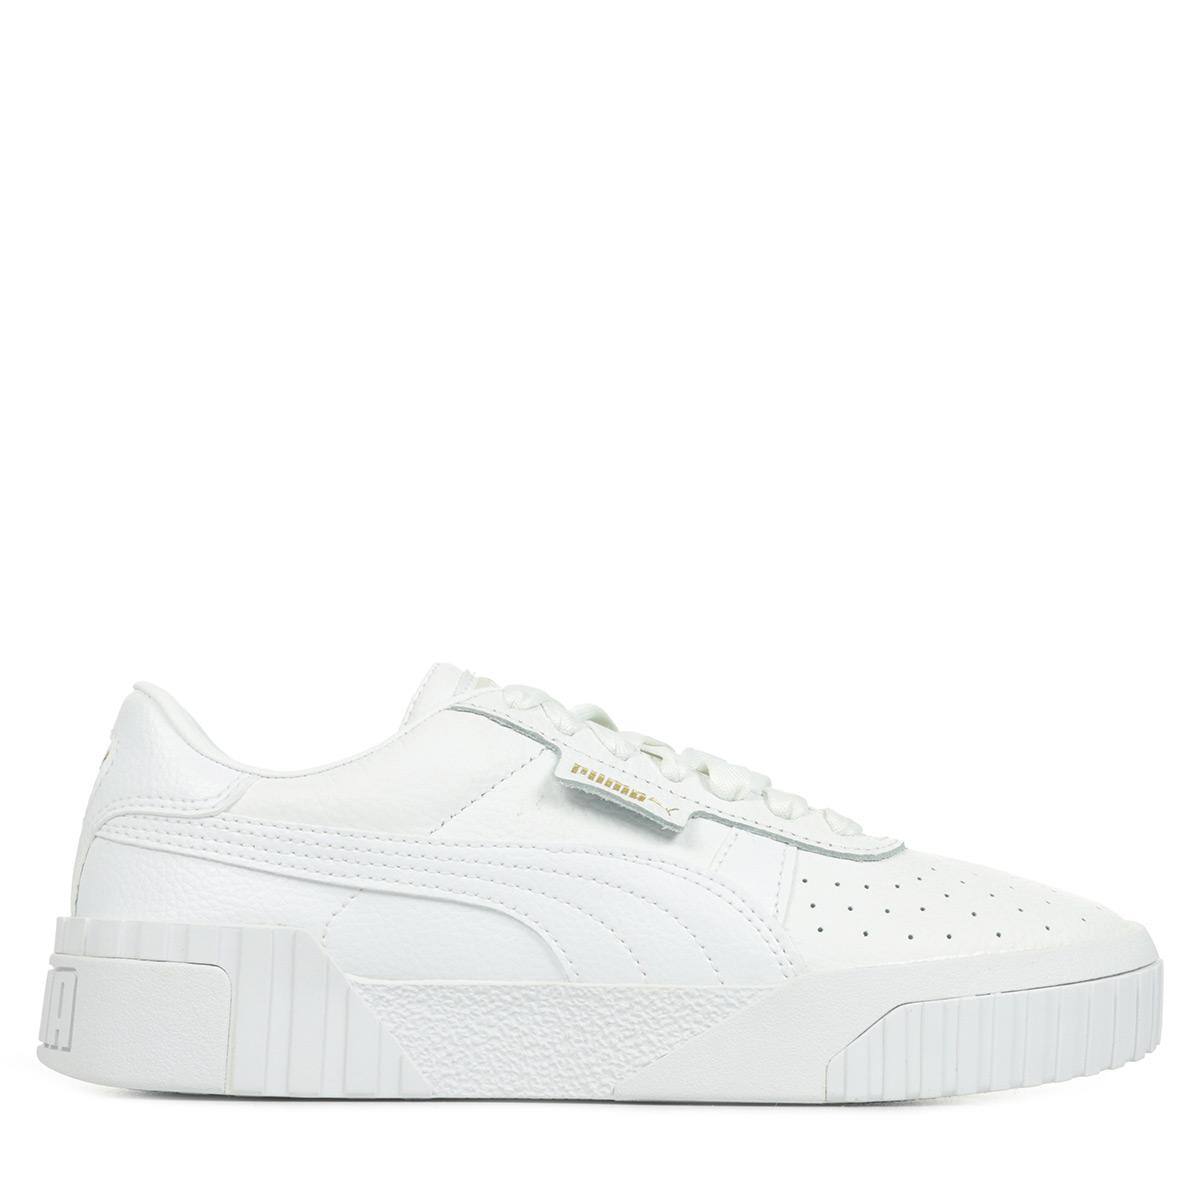 56ca1a8a2cf Puma Cali Fashion Wn s 36915501